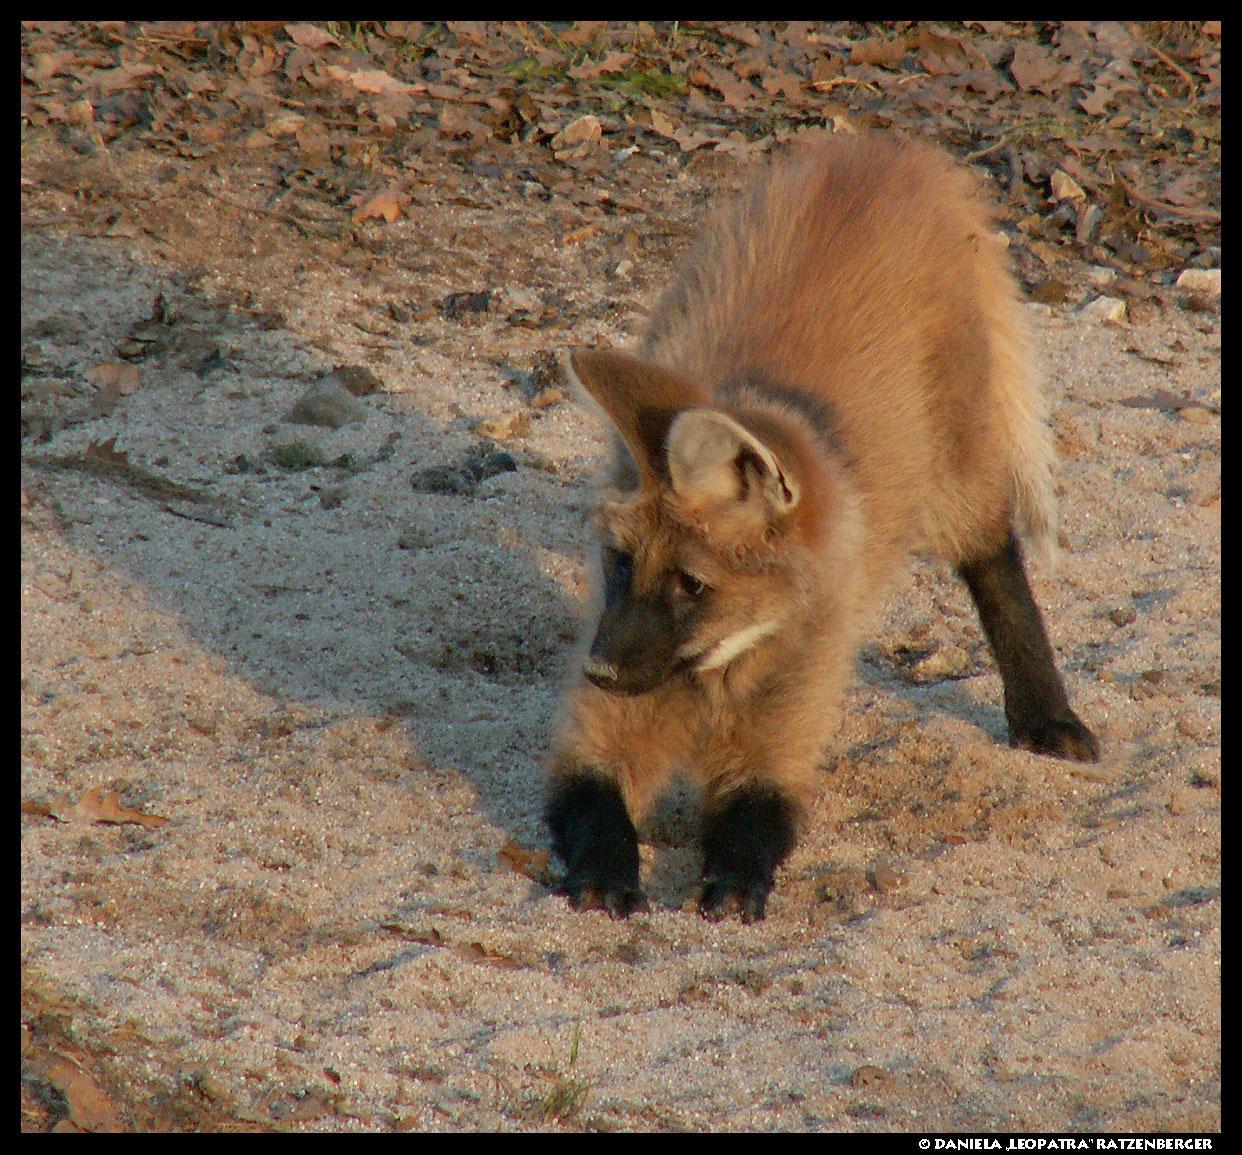 wolf kissing its cub - photo #29